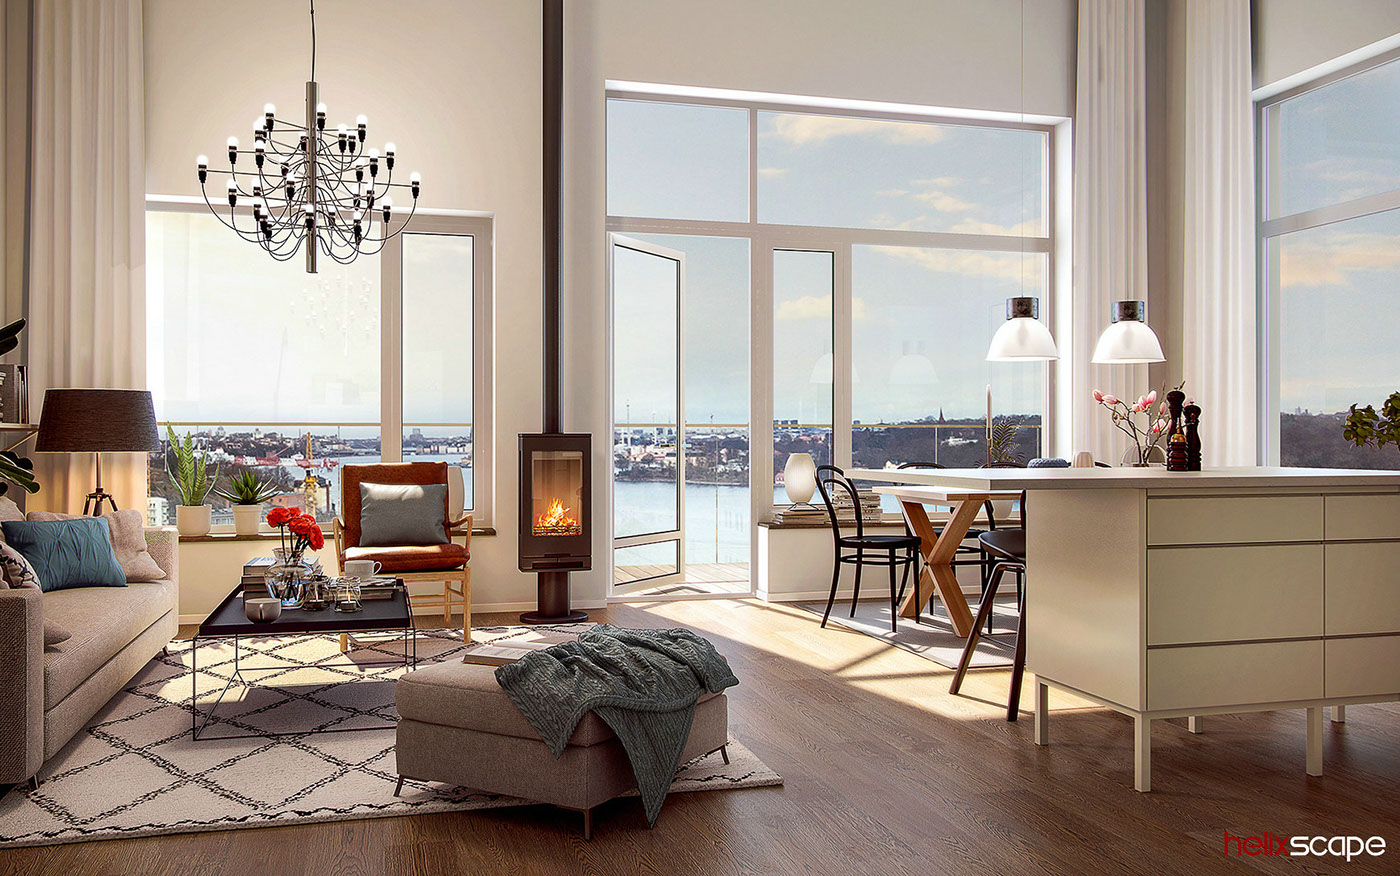 architectural visualization 3D Rendering Interior design